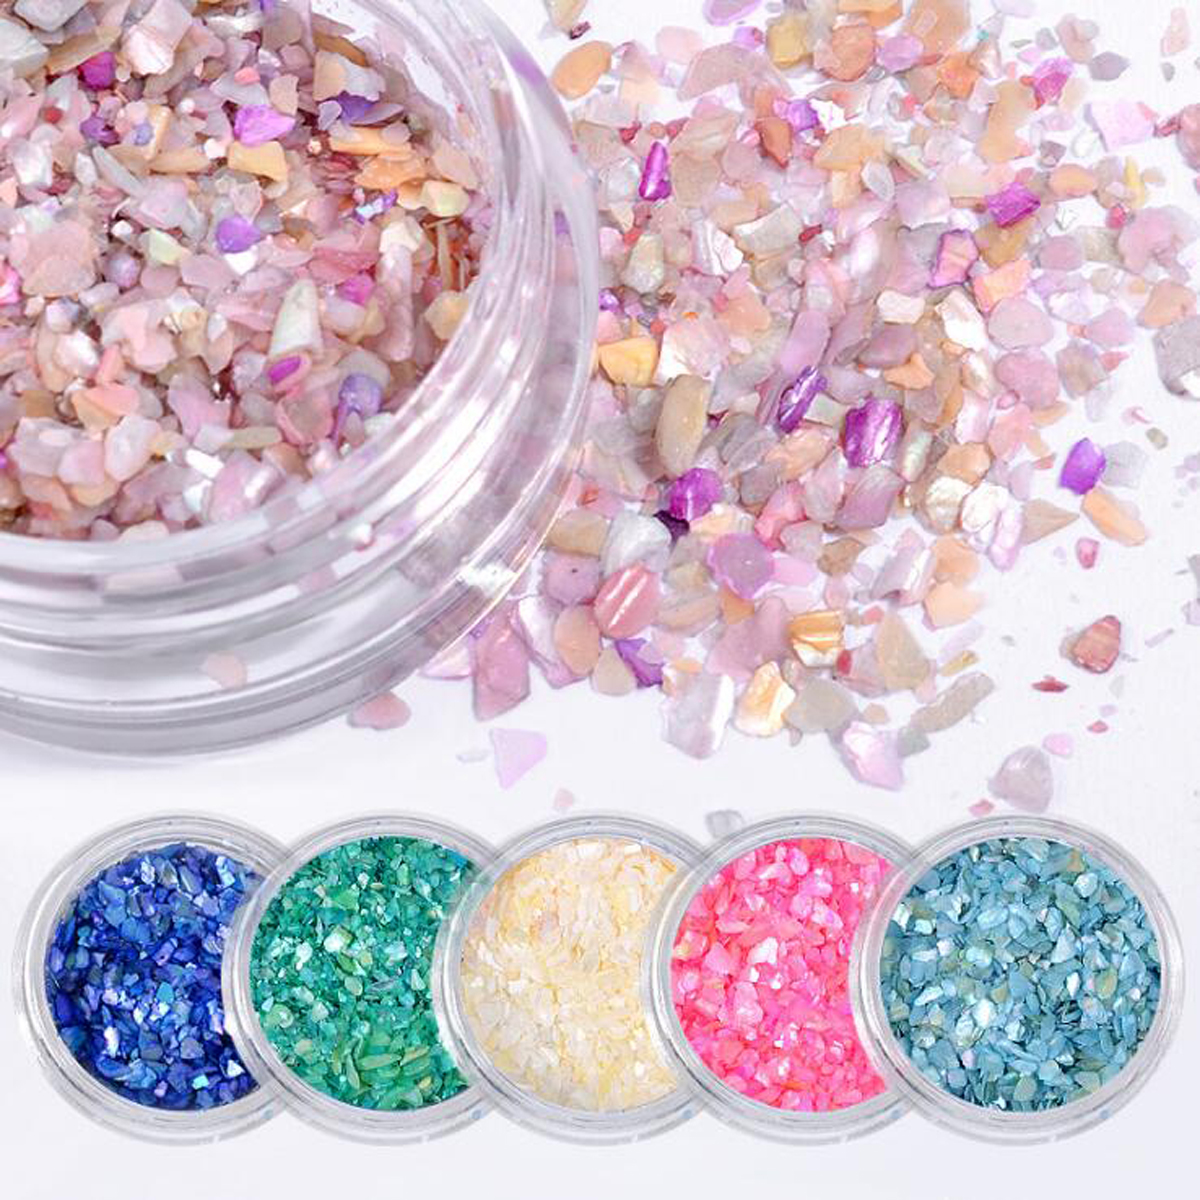 Nail Art Glitter Jewelry Set Natural Shell Small Crushed Stone Sequins Symphony DIY Nail Patch Decorations 6box/set